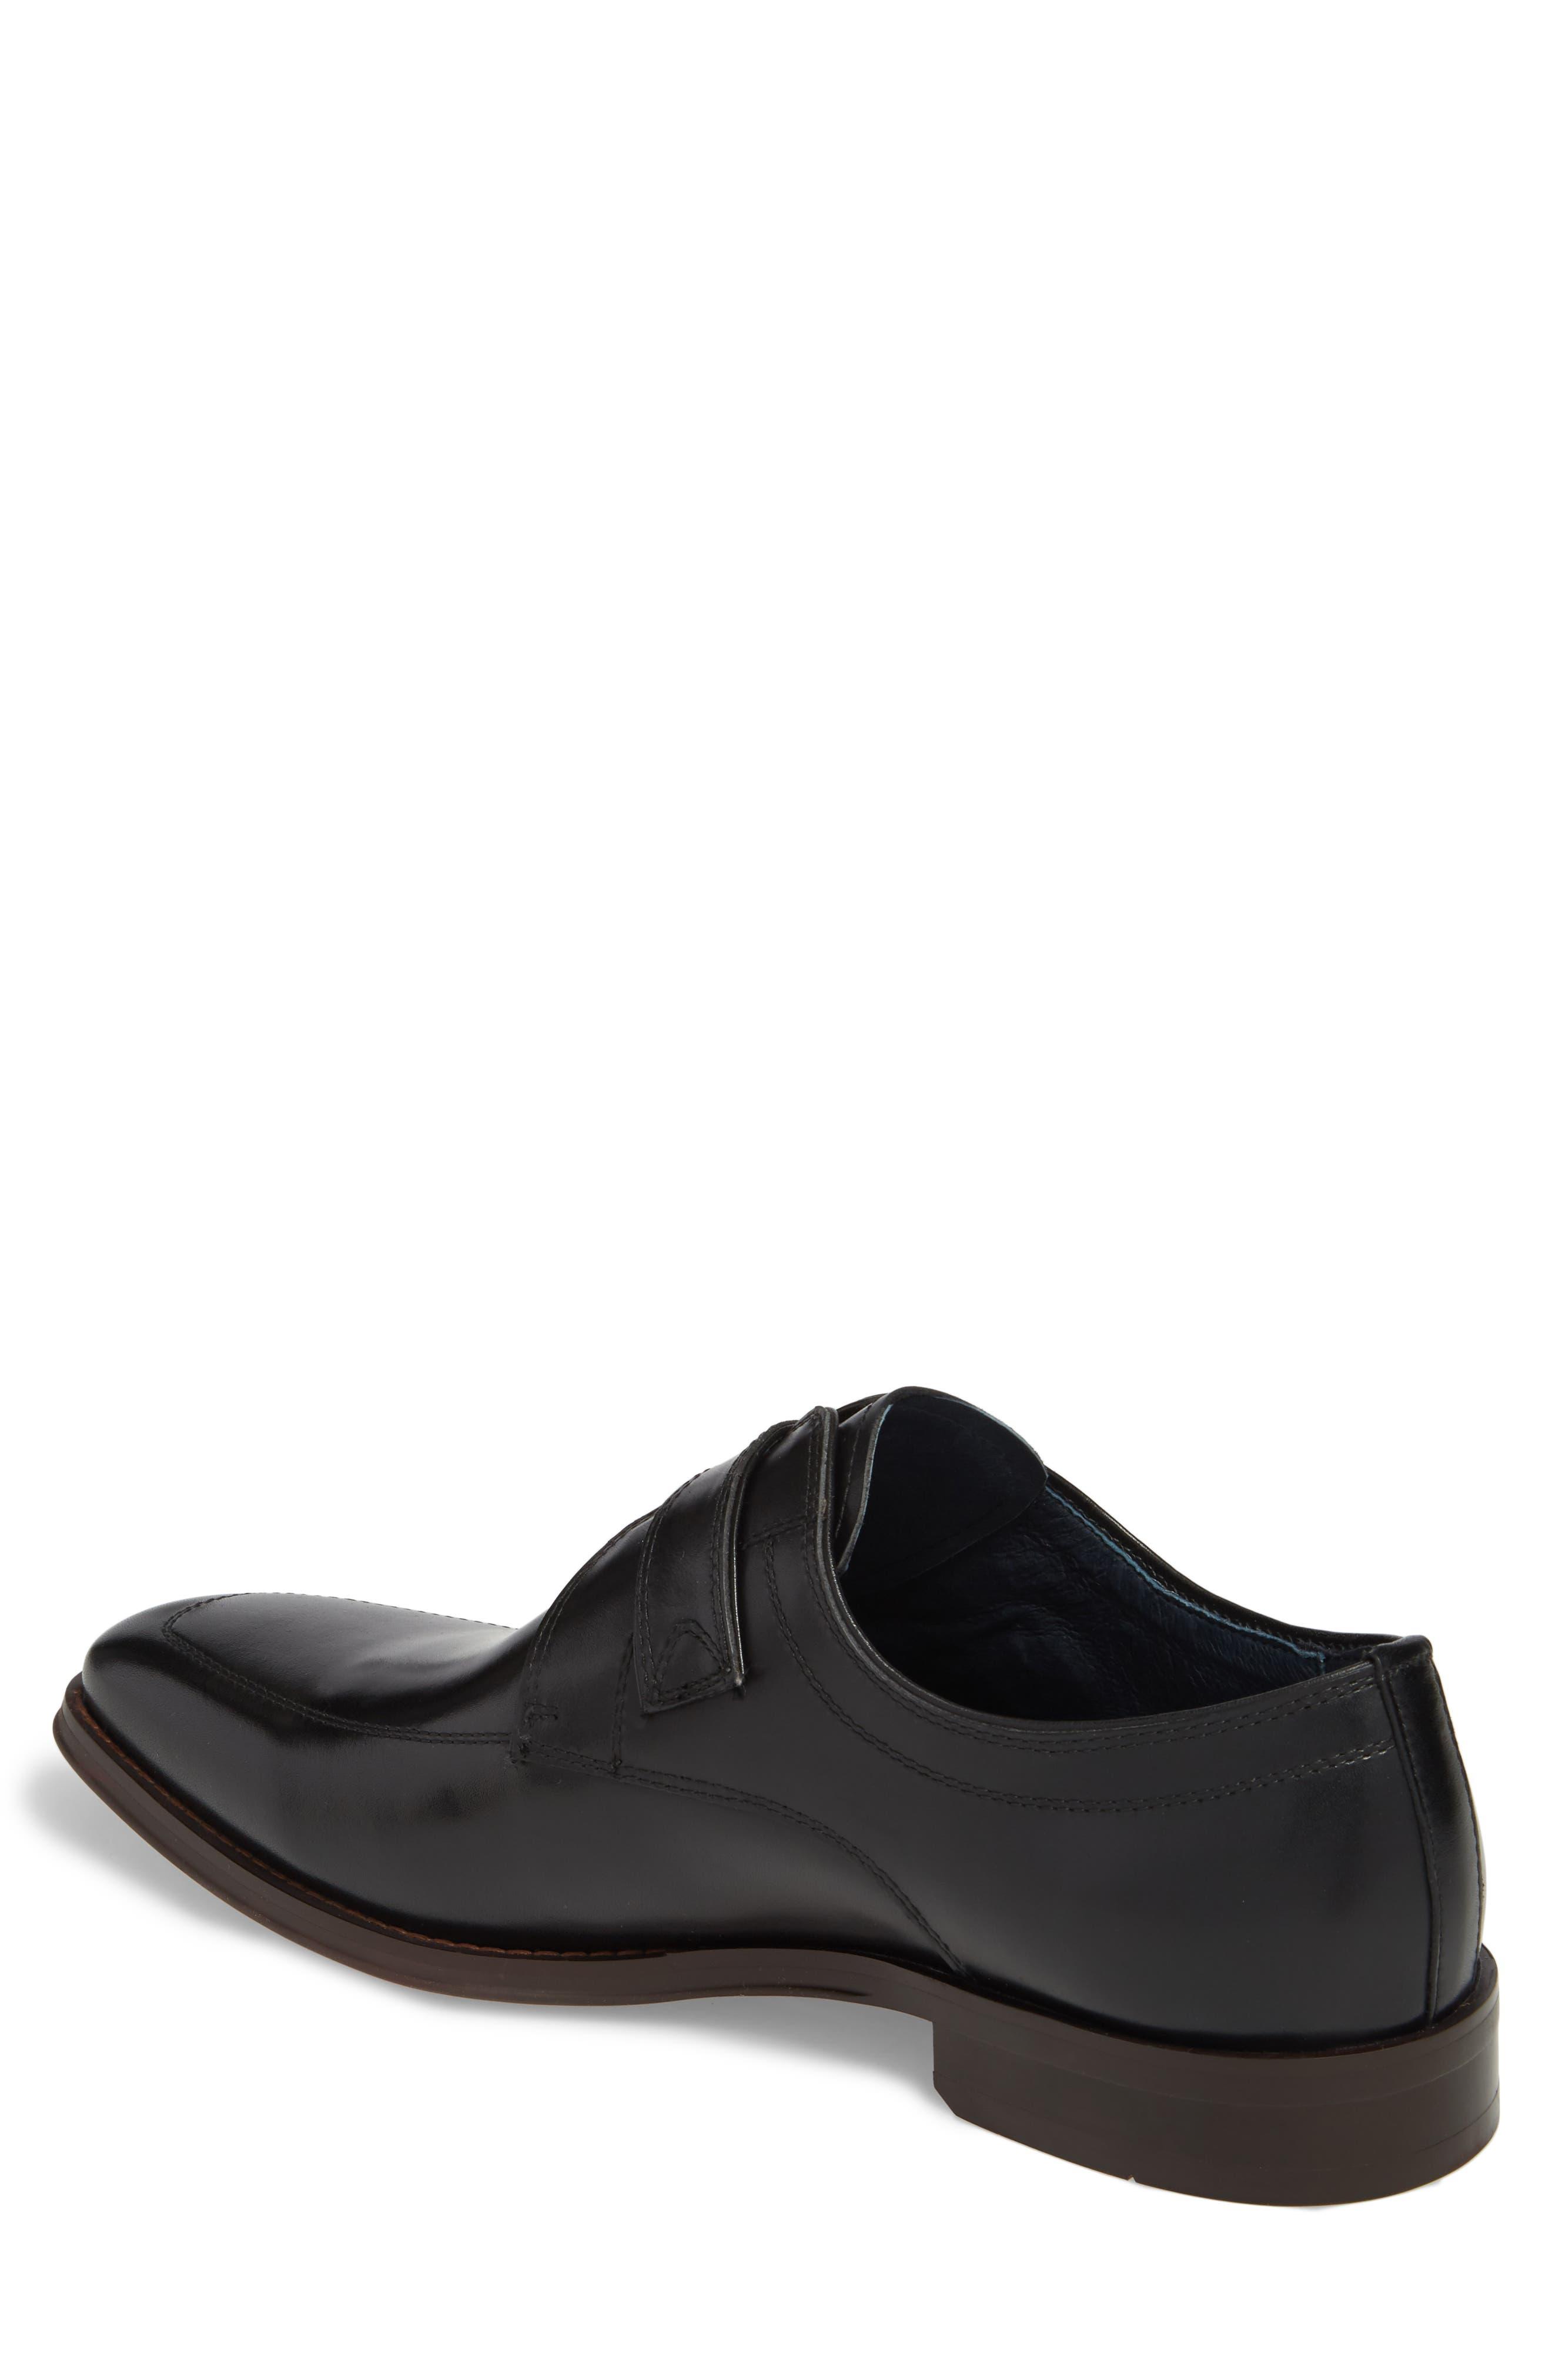 Merlot Single Buckle Monk Shoe,                             Alternate thumbnail 2, color,                             BLACK LEATHER